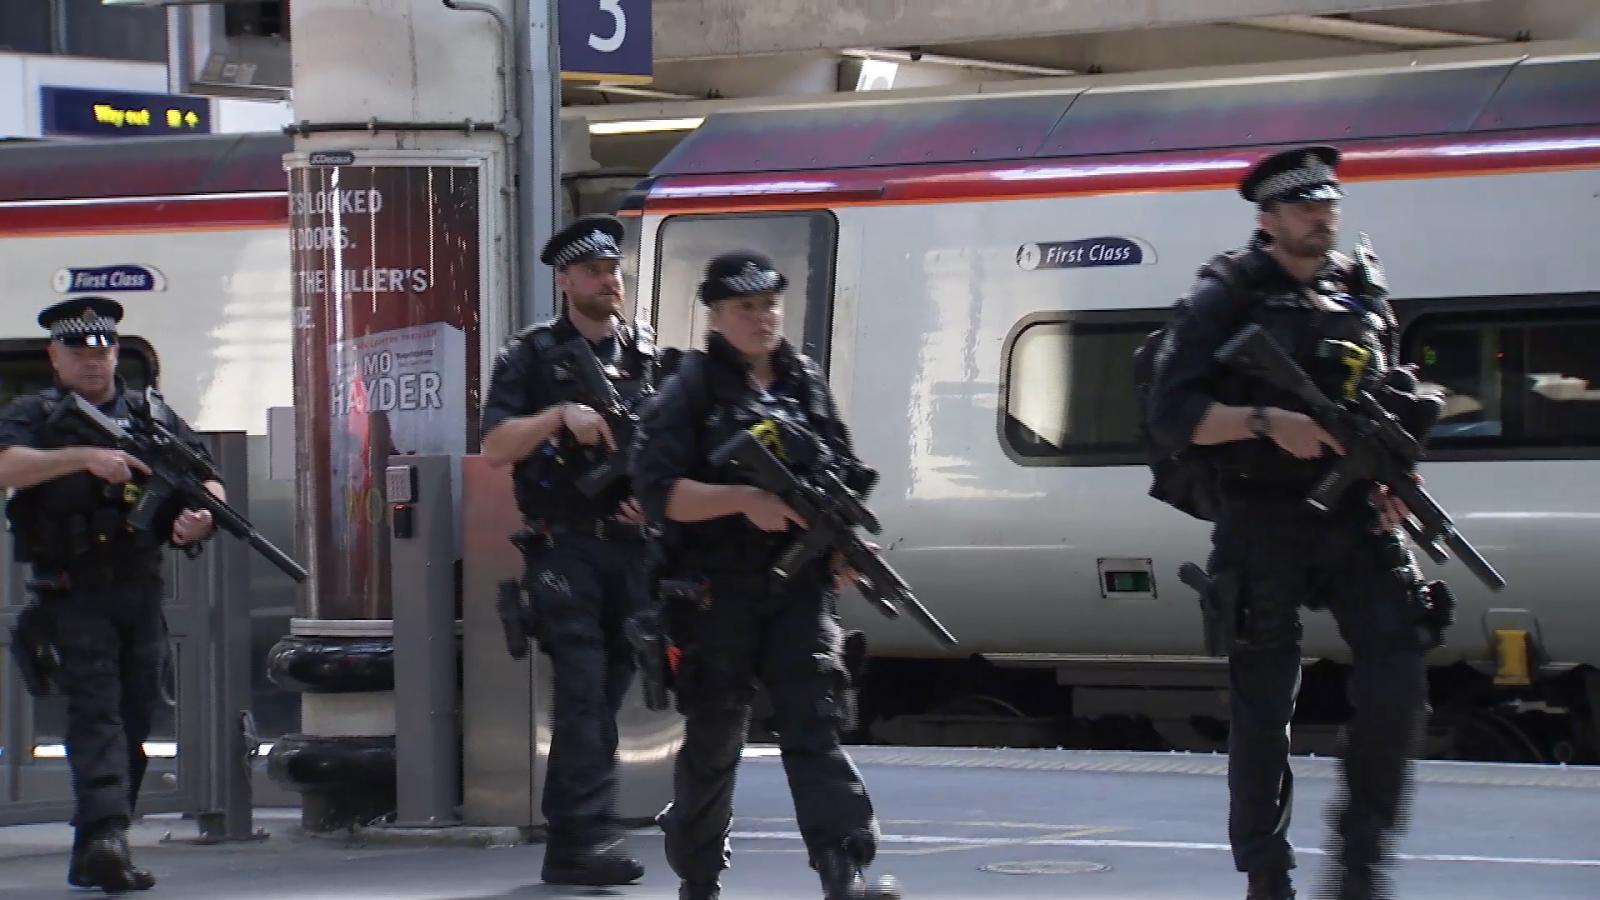 armed-police-patrol-major-u-k-train-stations-after-terror-attack